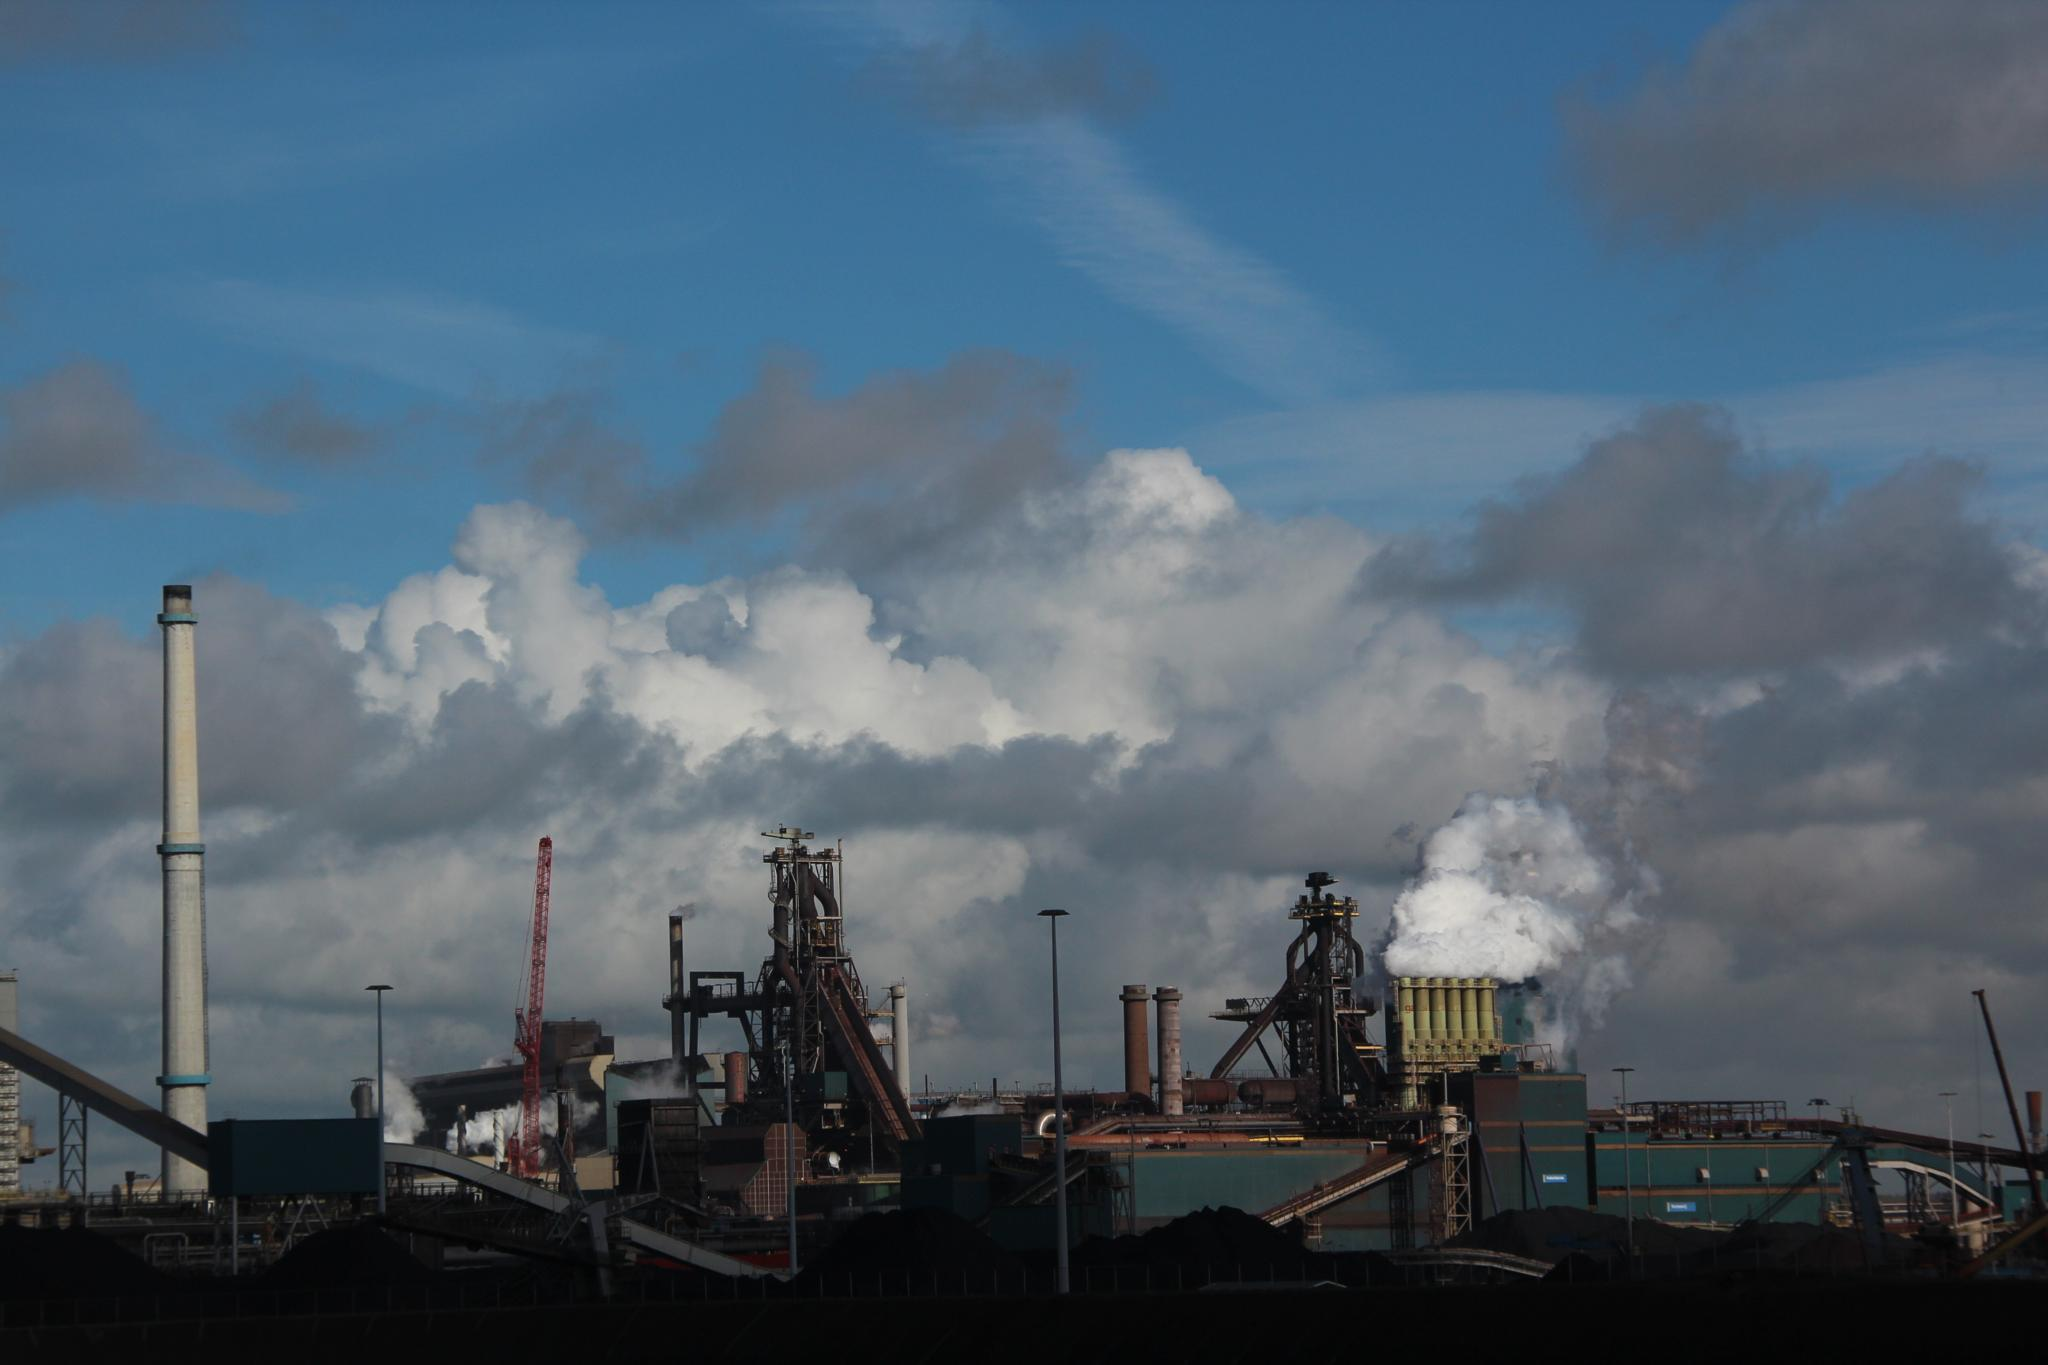 TATA Steel plant, Velsen, Holland by Henk de Groot